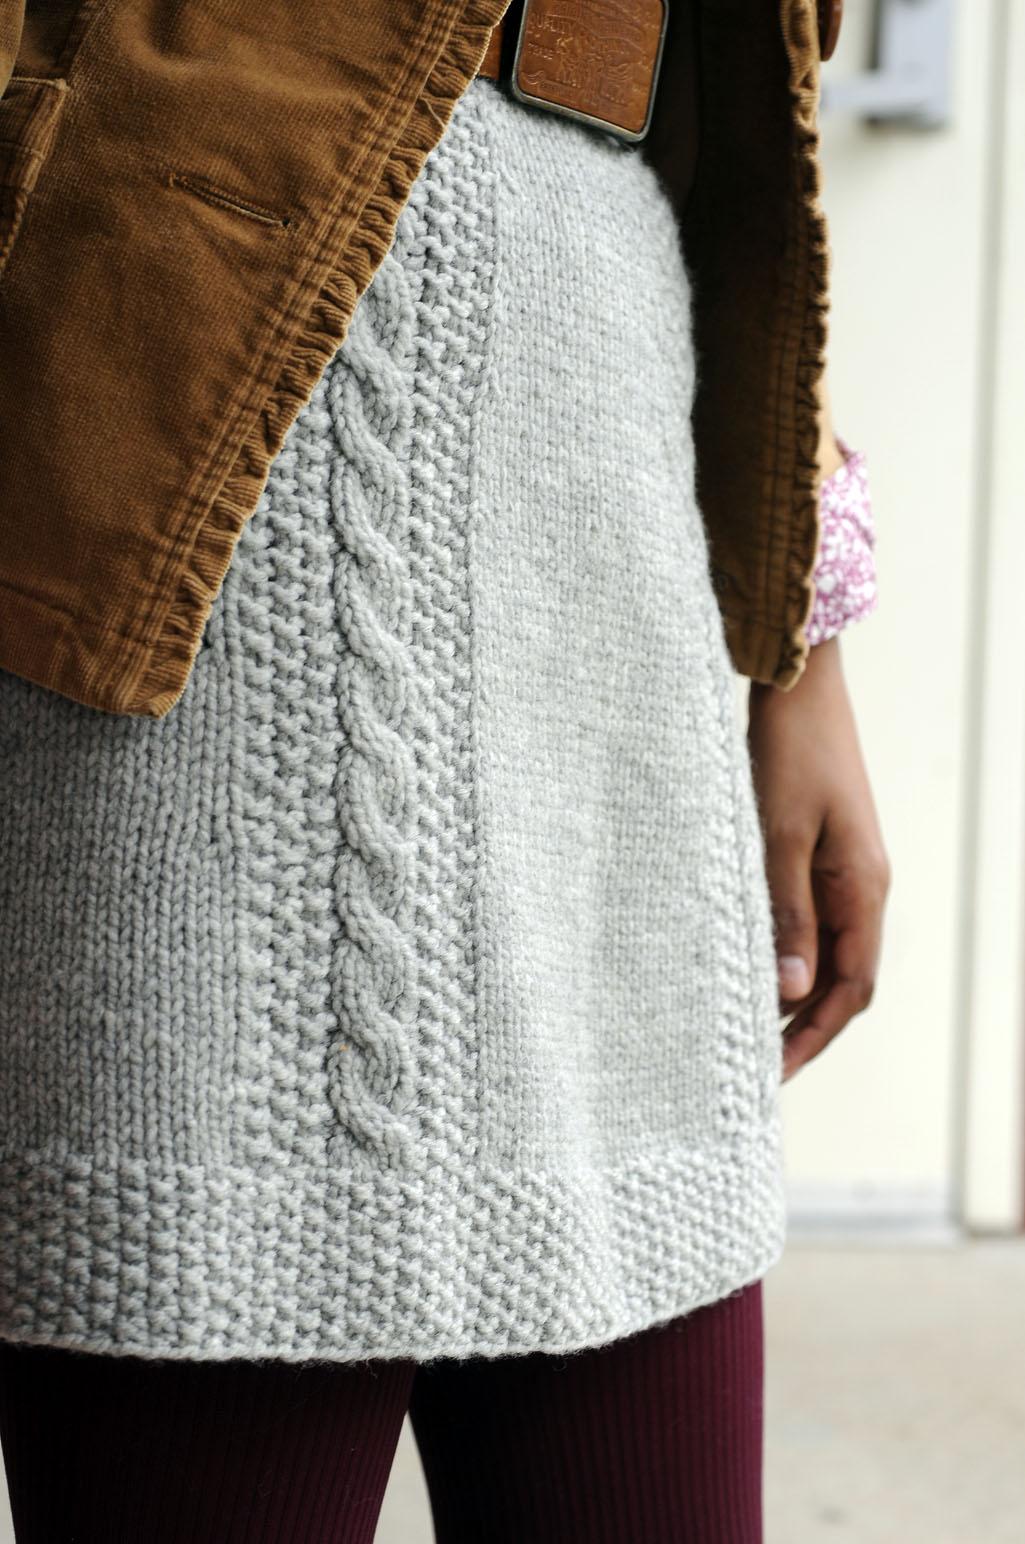 Knitting Skirt Tutorial : Bryn mawr skirt interweave